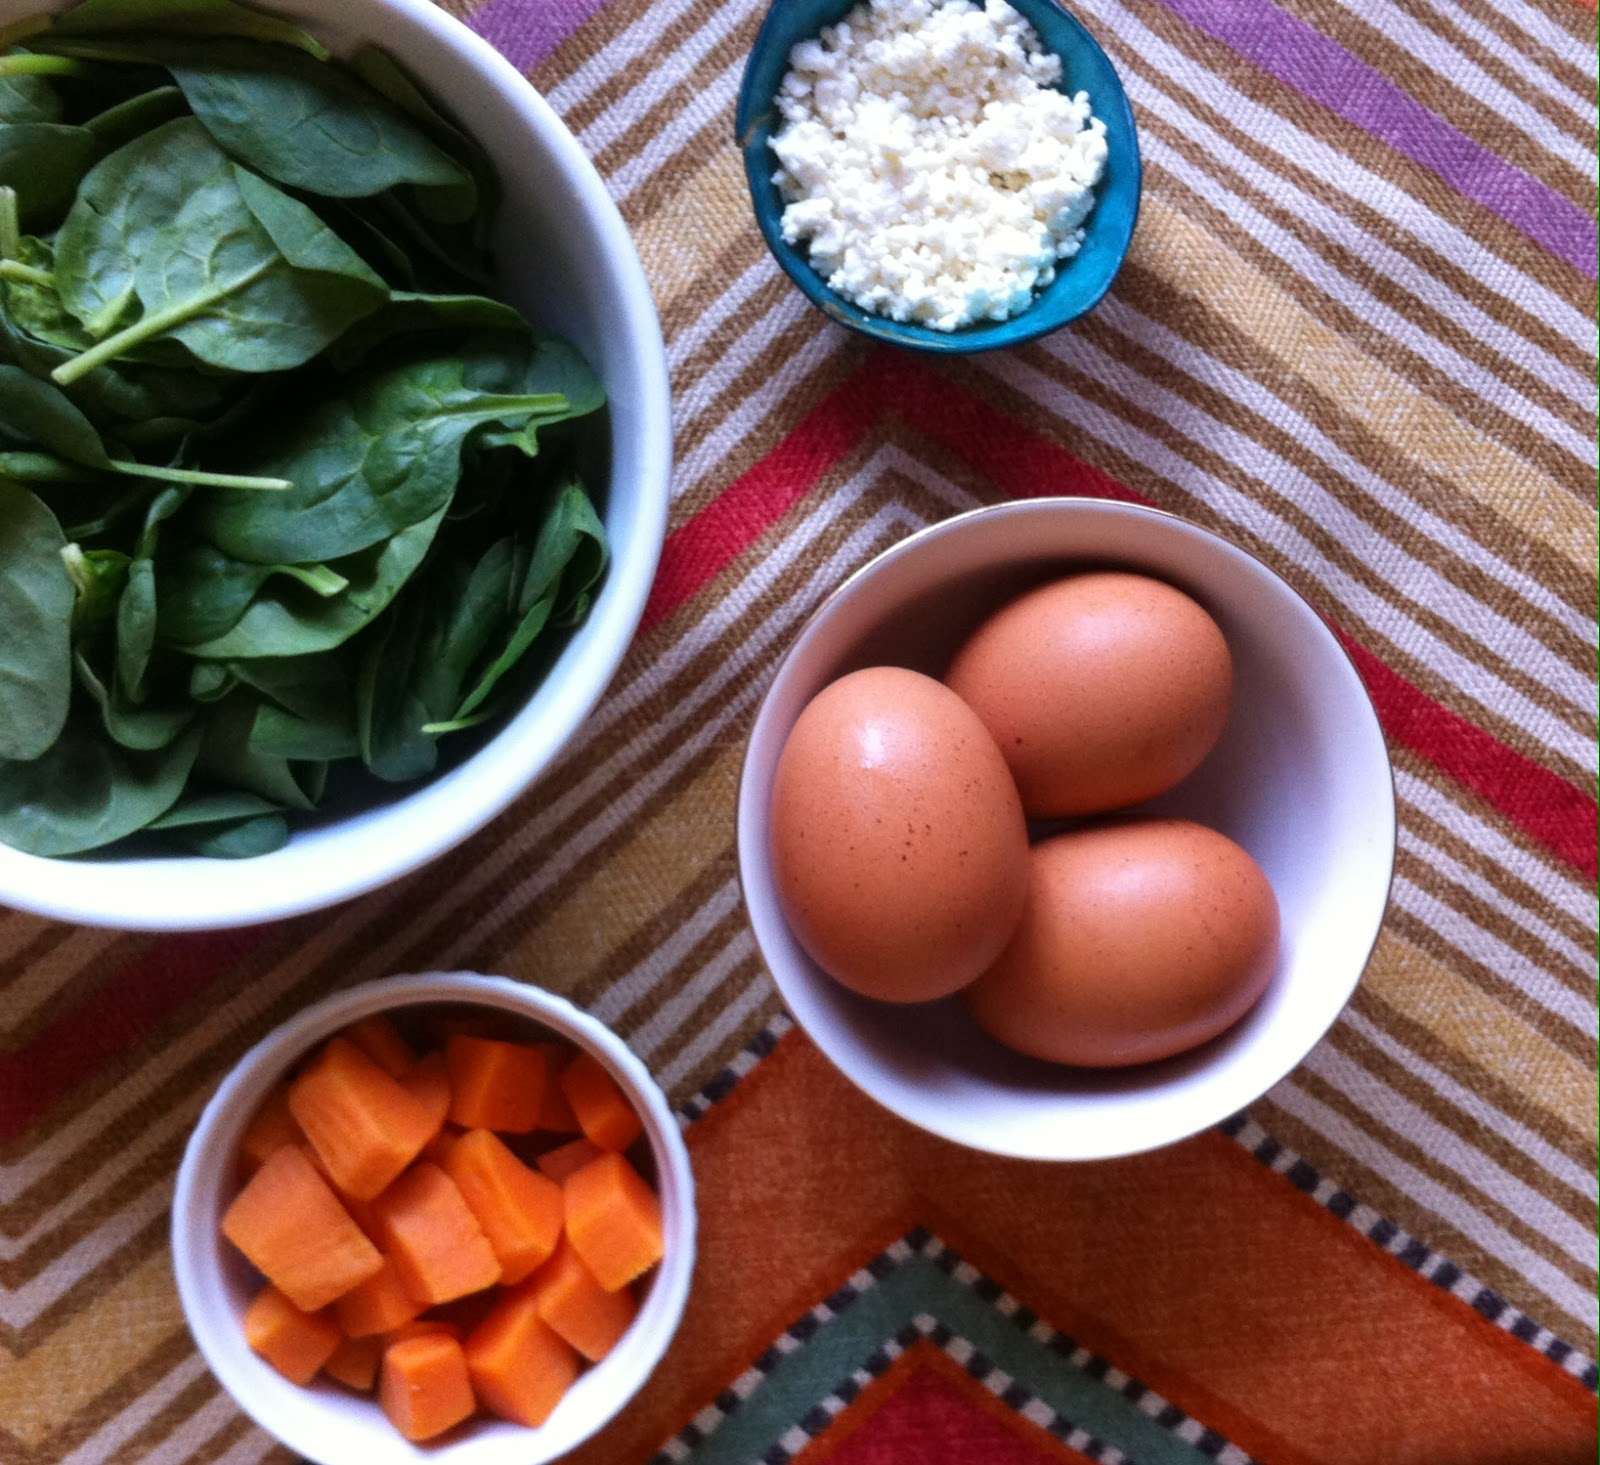 delight by design: mouse morsels {sweet potato + feta frittata}